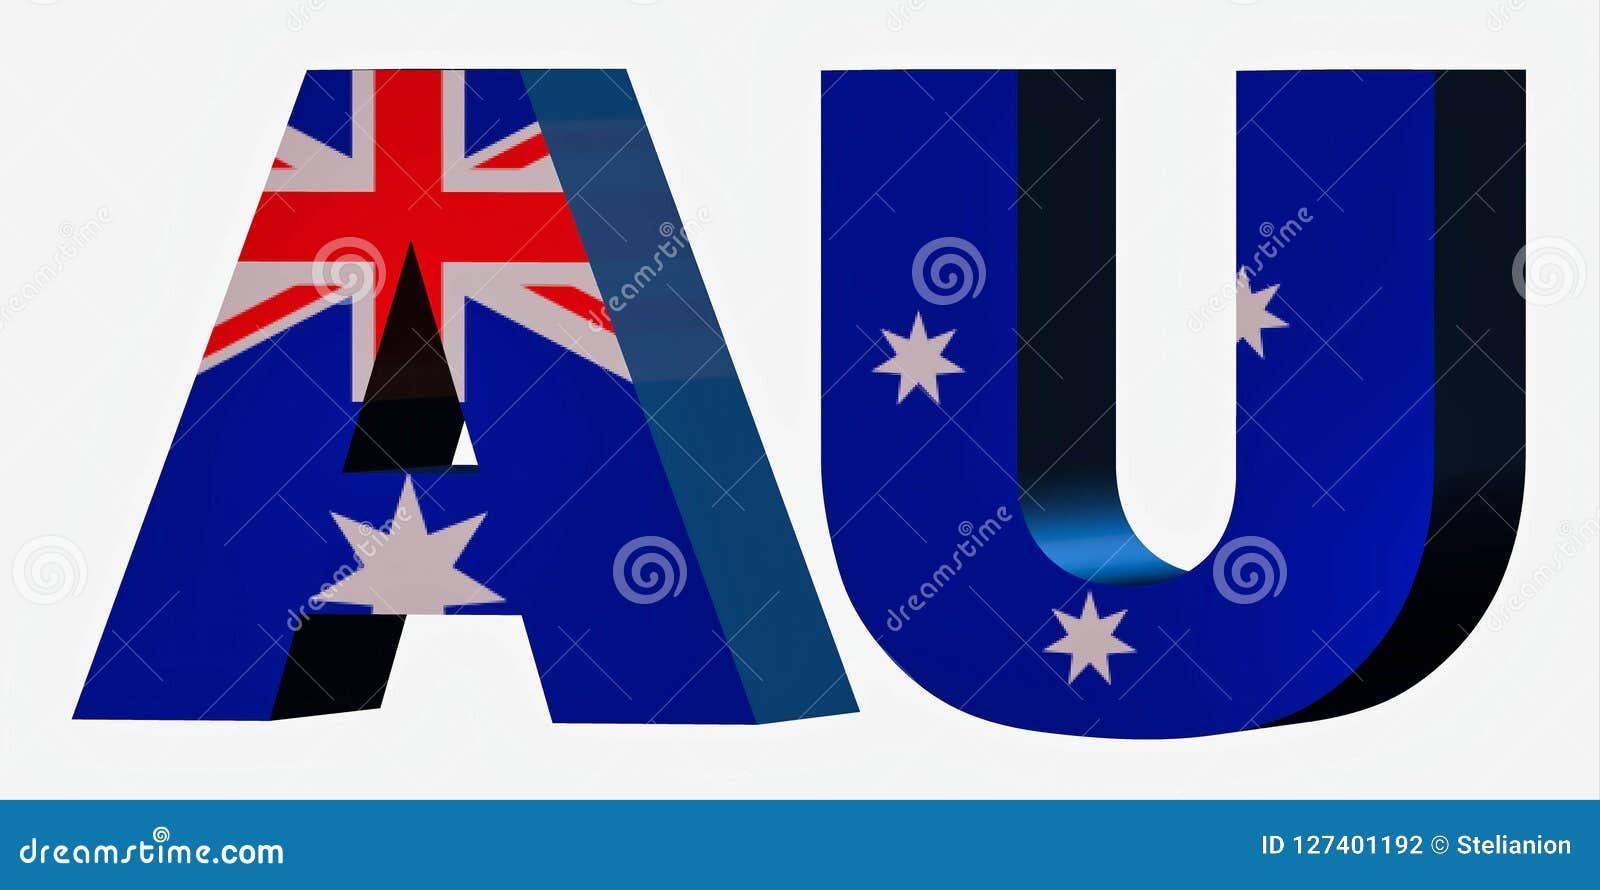 3d Country Short Code Letters - Australia Stock Illustration